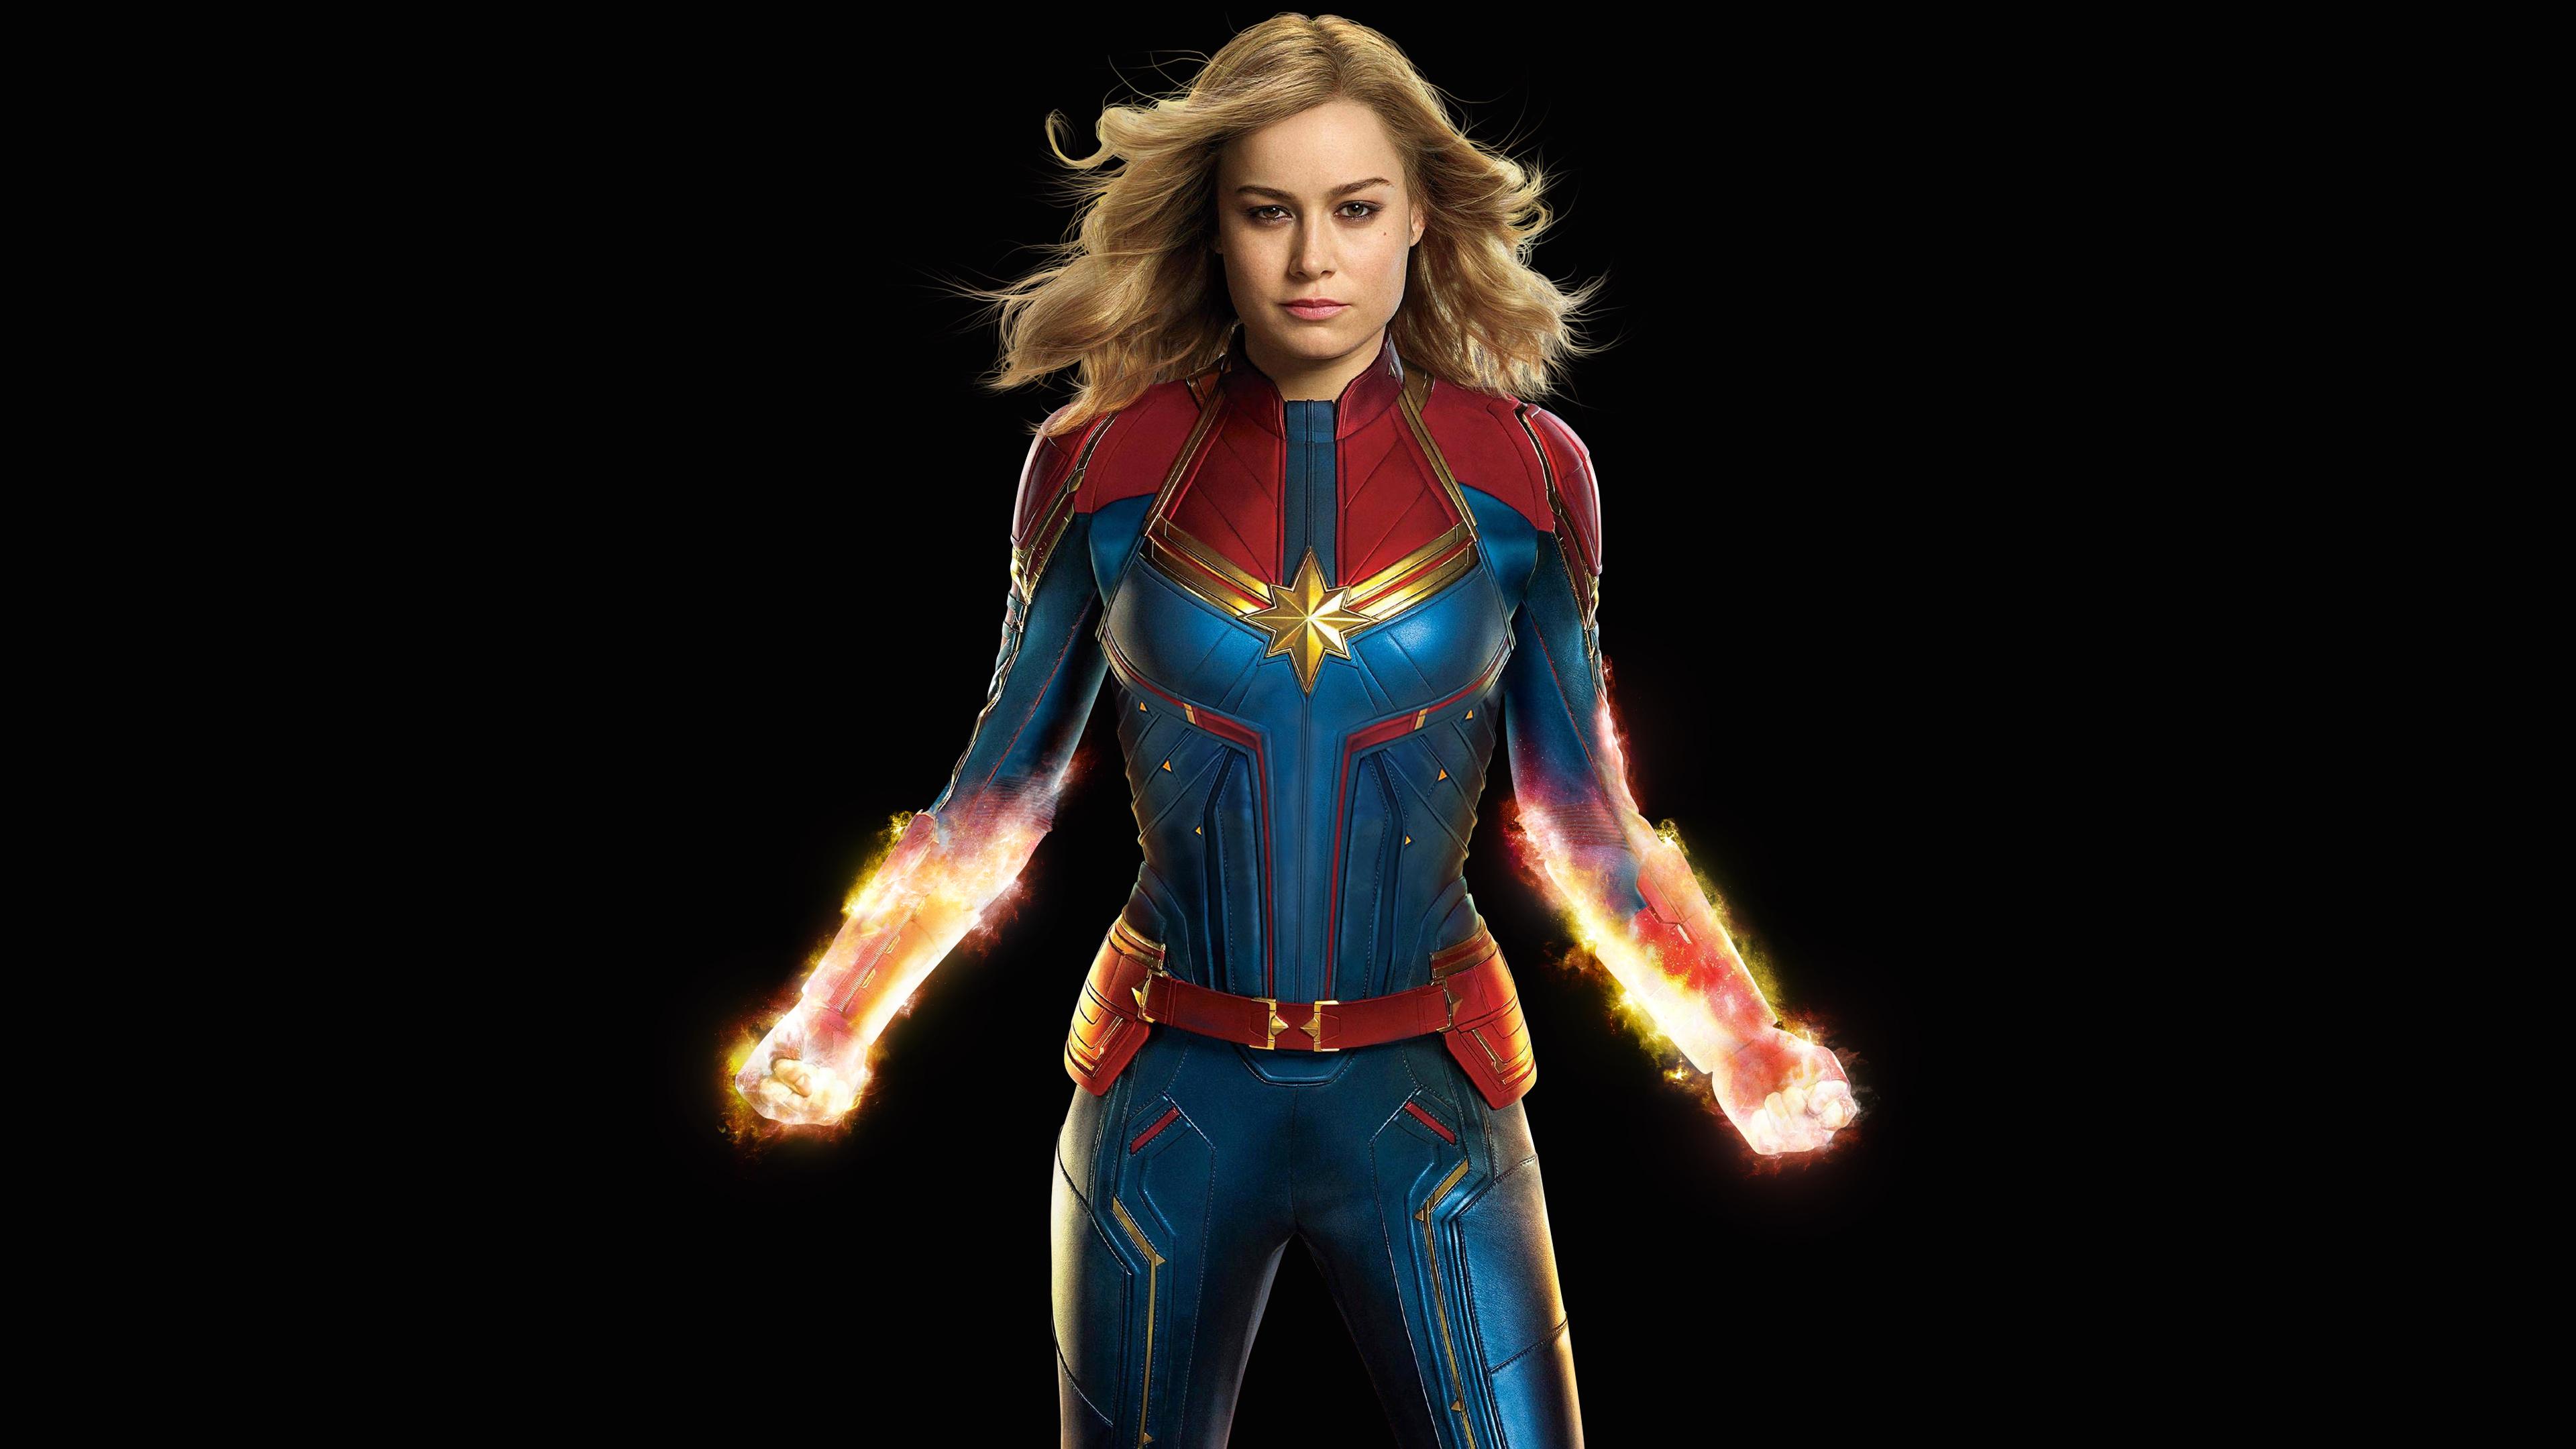 Ảnh Captain Marvel xinh gái